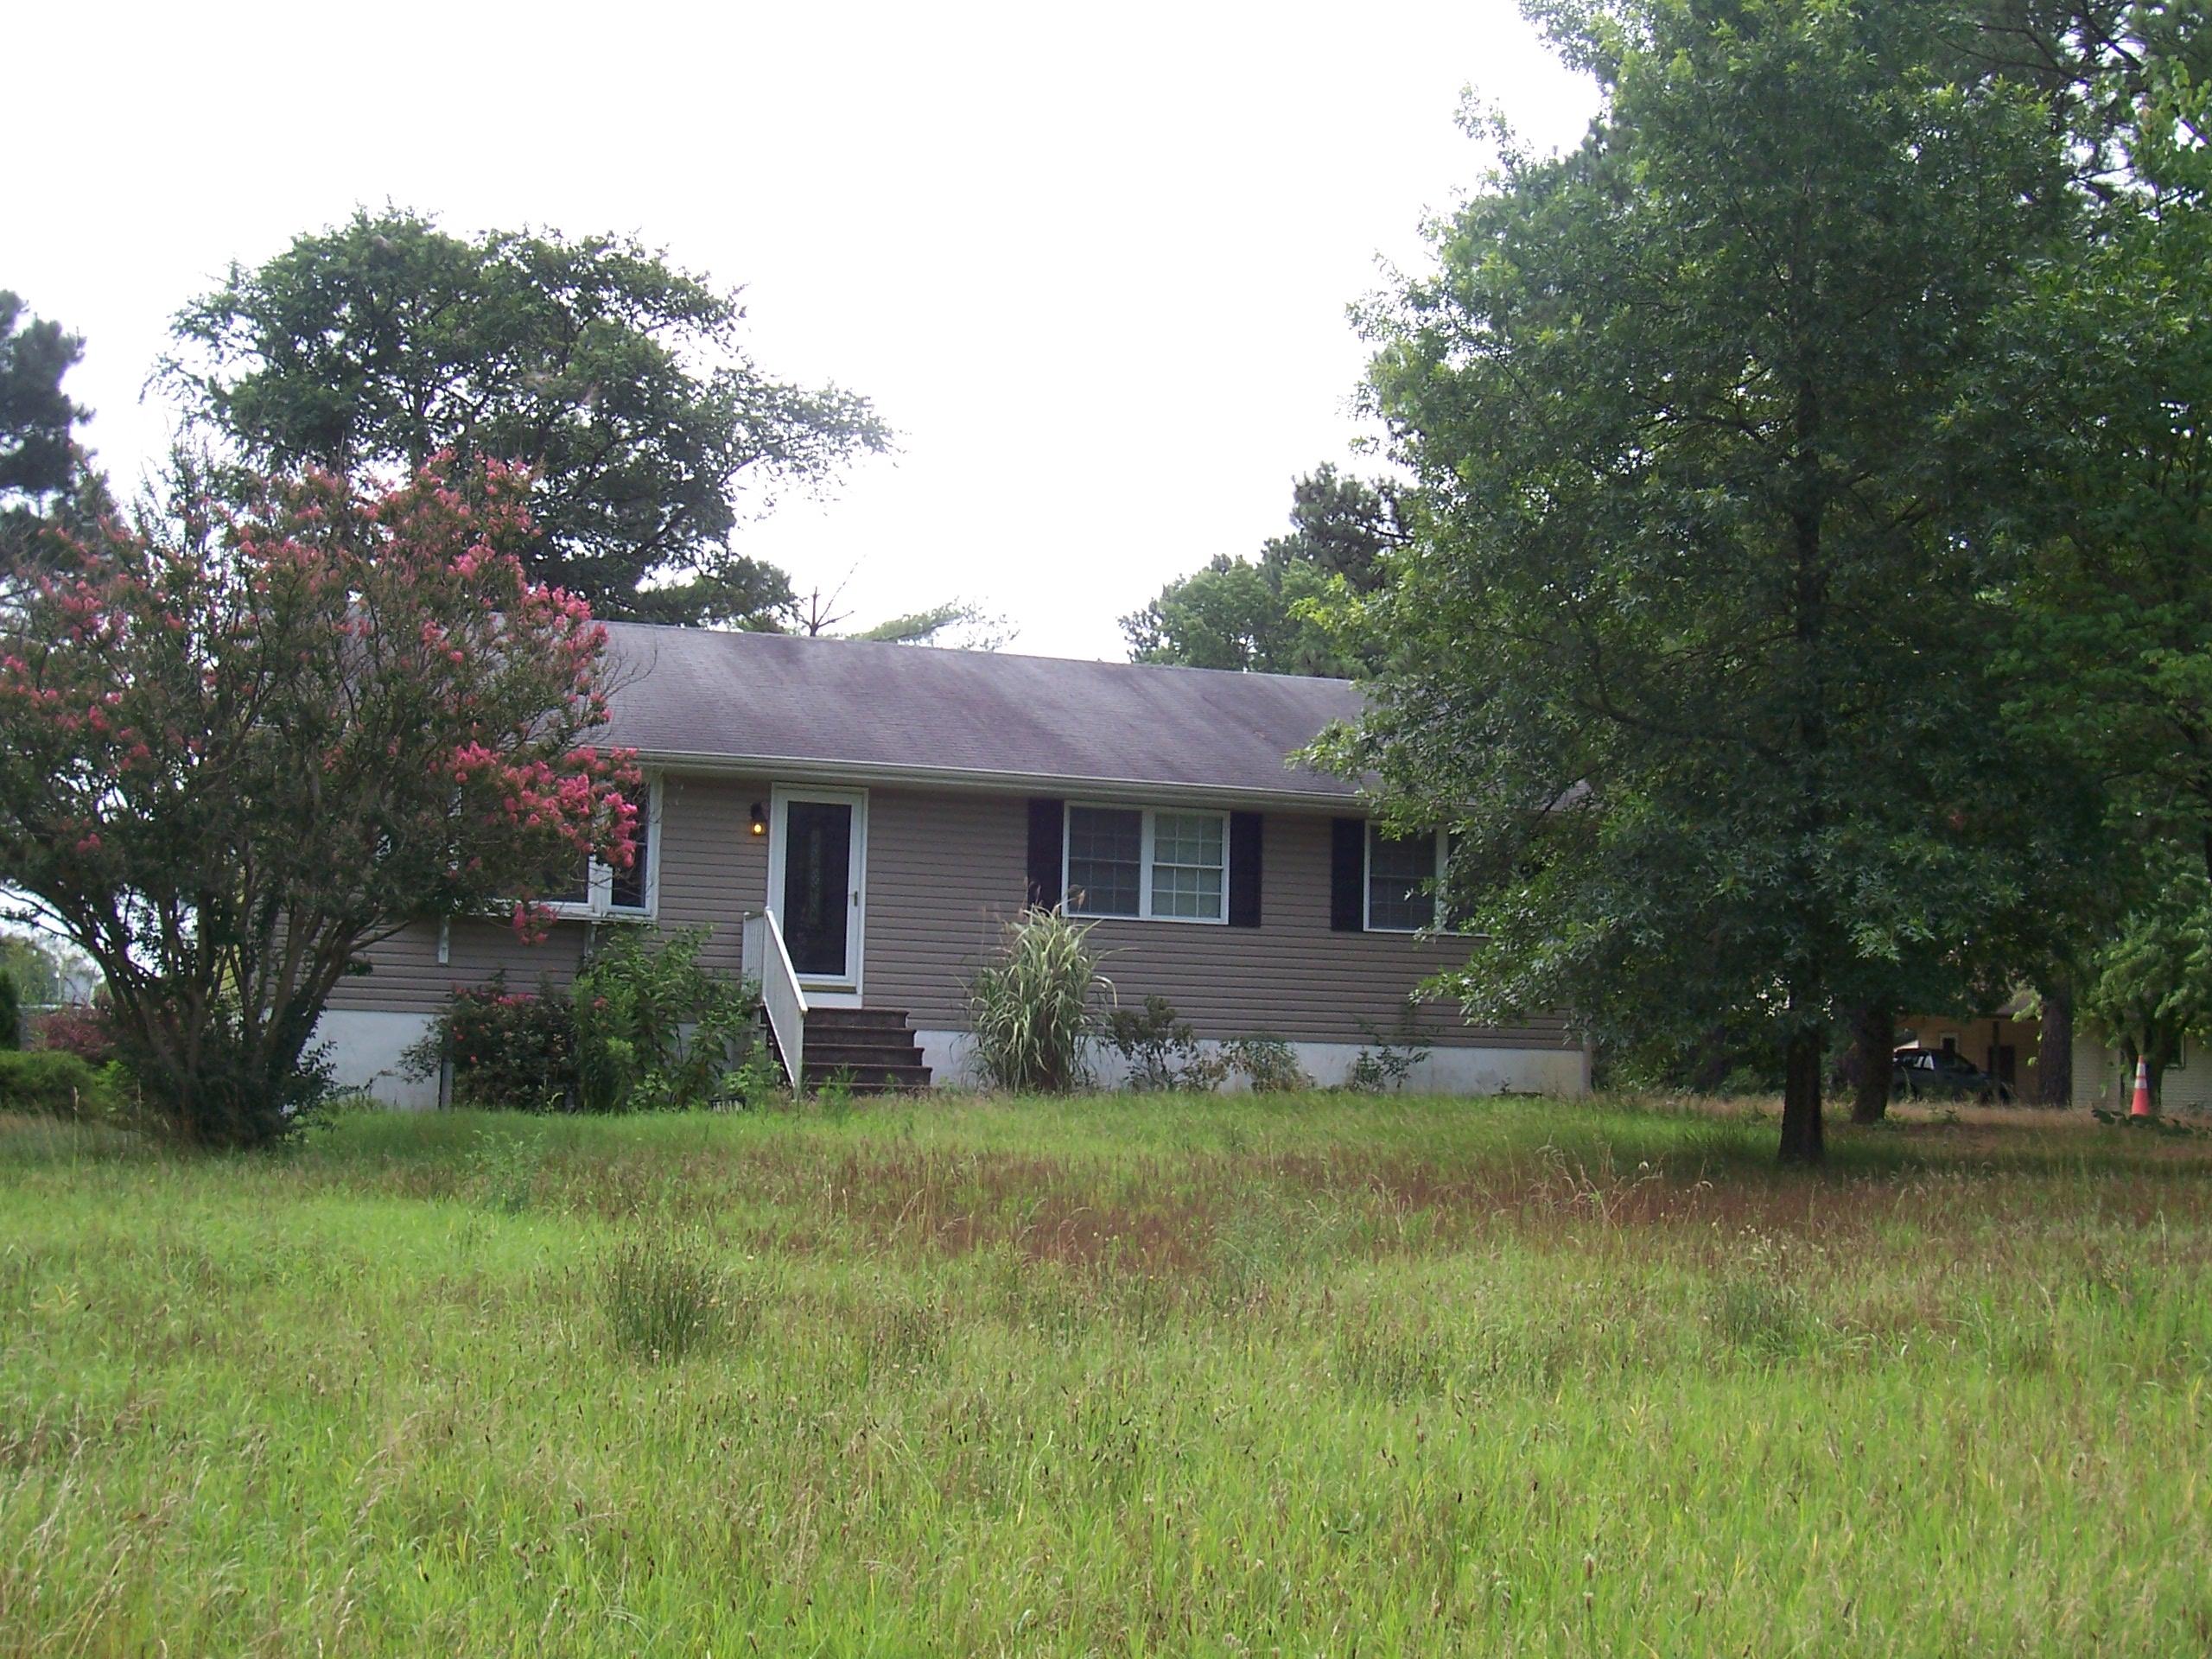 11087 Sharptown Rd, Mardela Springs, Maryland 21837